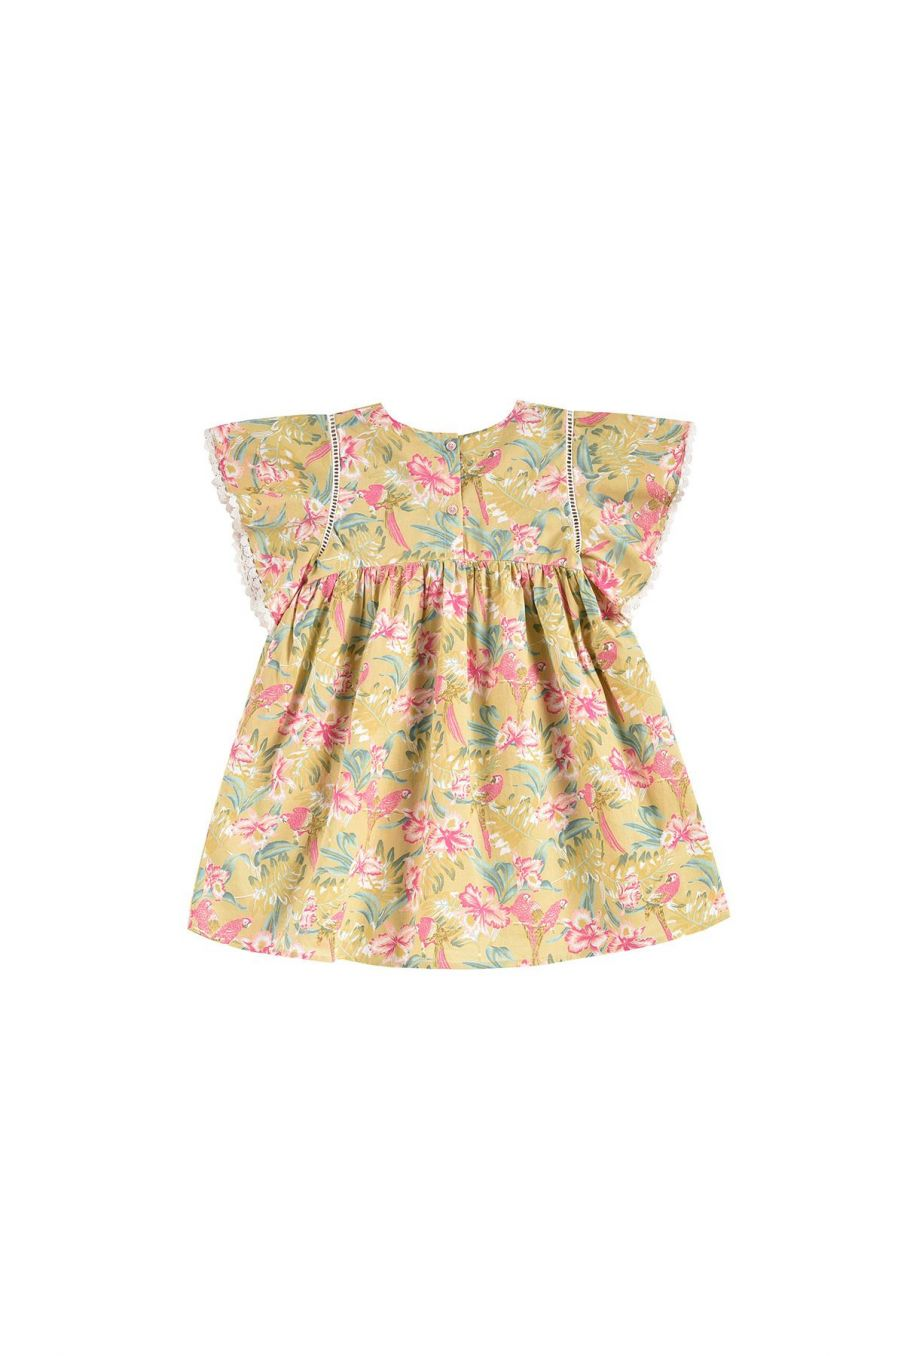 boheme chic vintage robe fille christina soft honey parrots